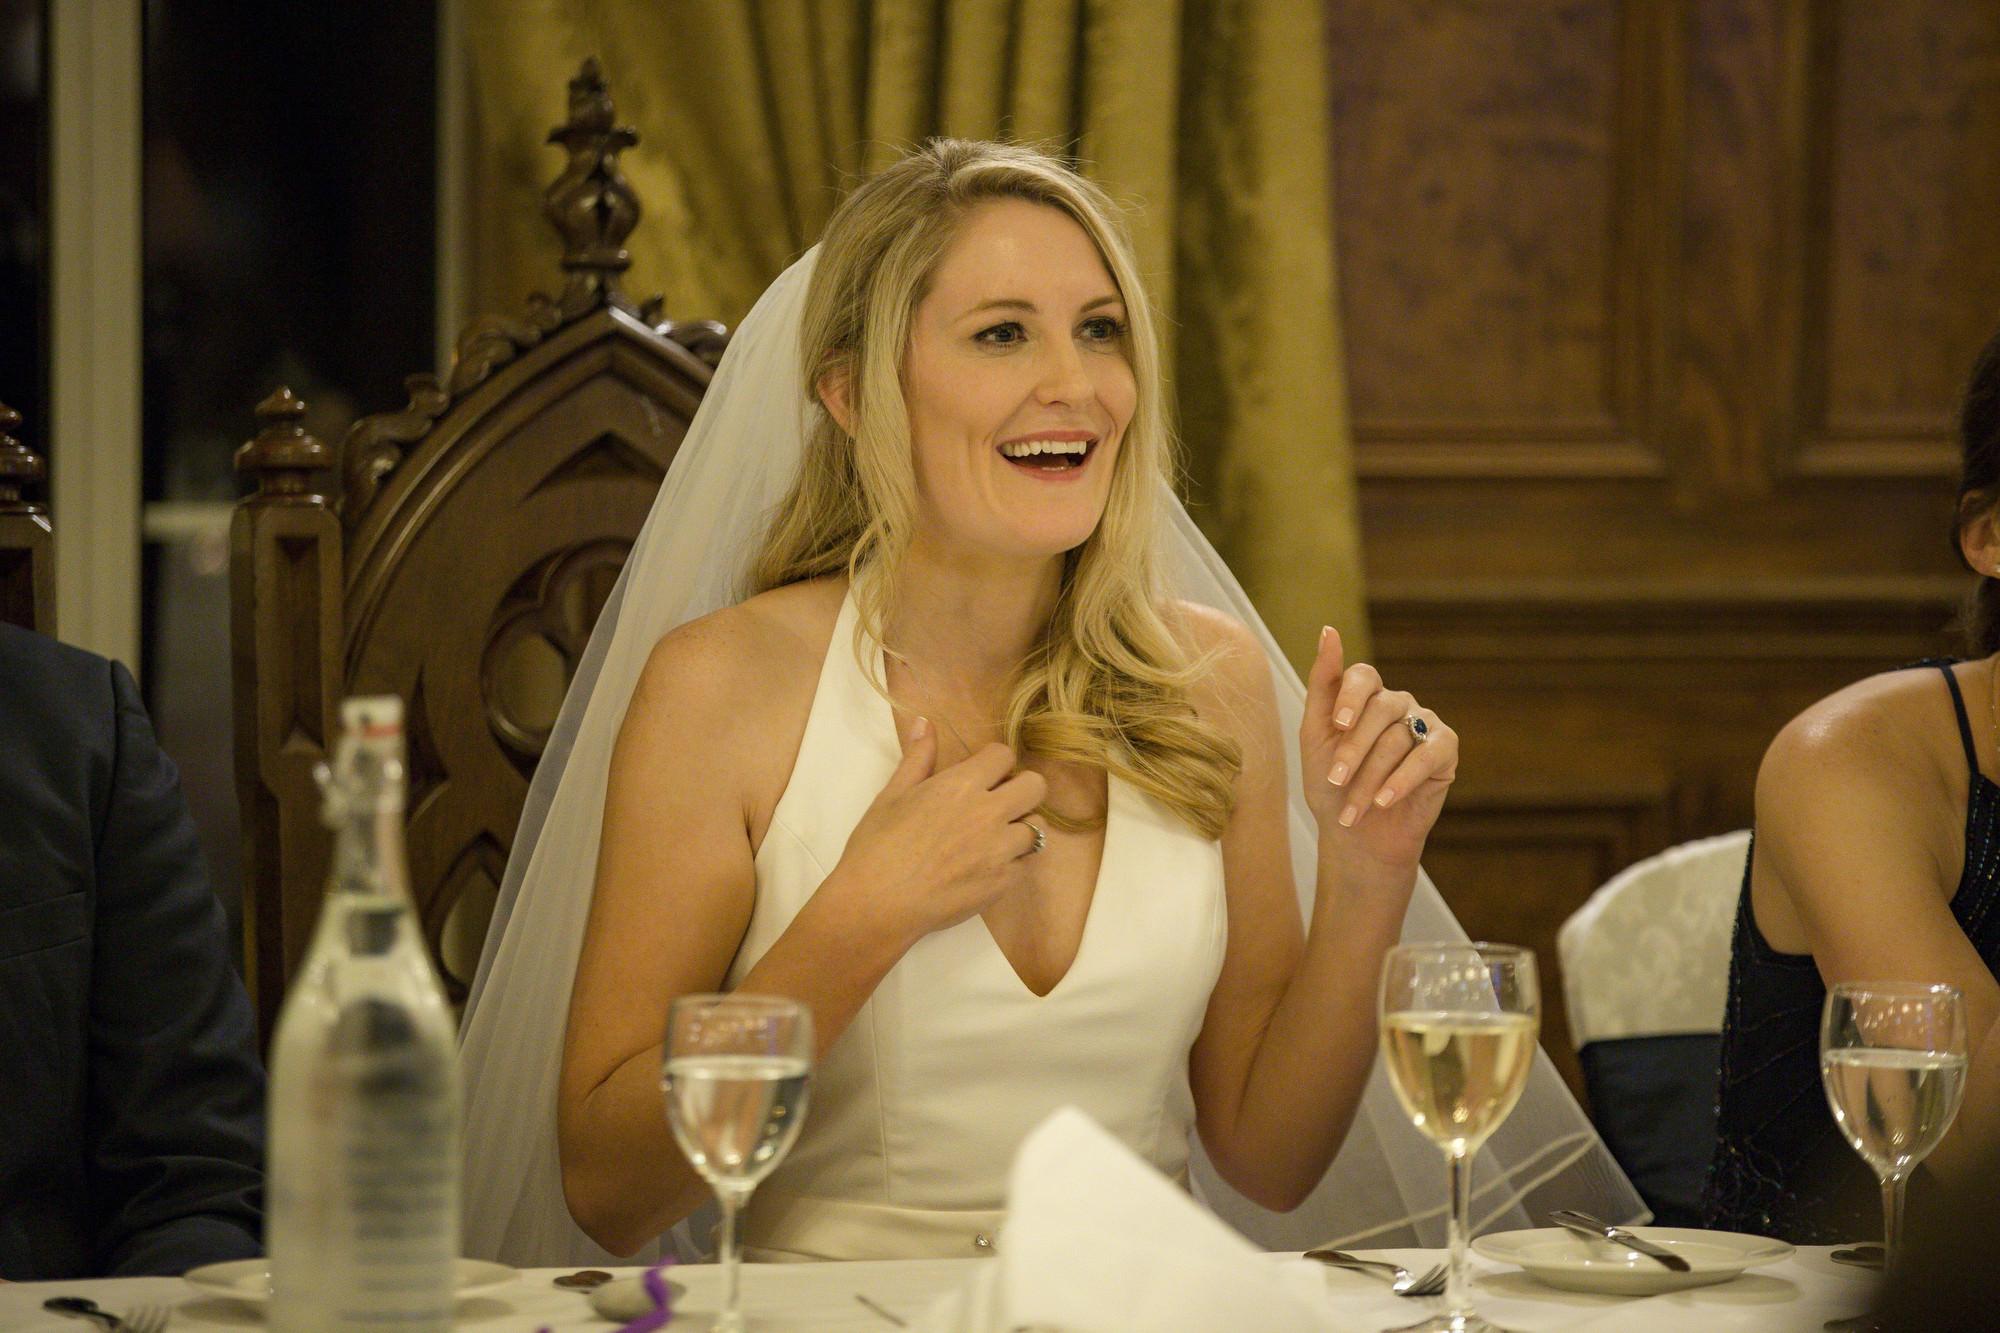 muckross_park_hotel_grougane_barra_wedding_photographer_goldenmoments_070.jpg